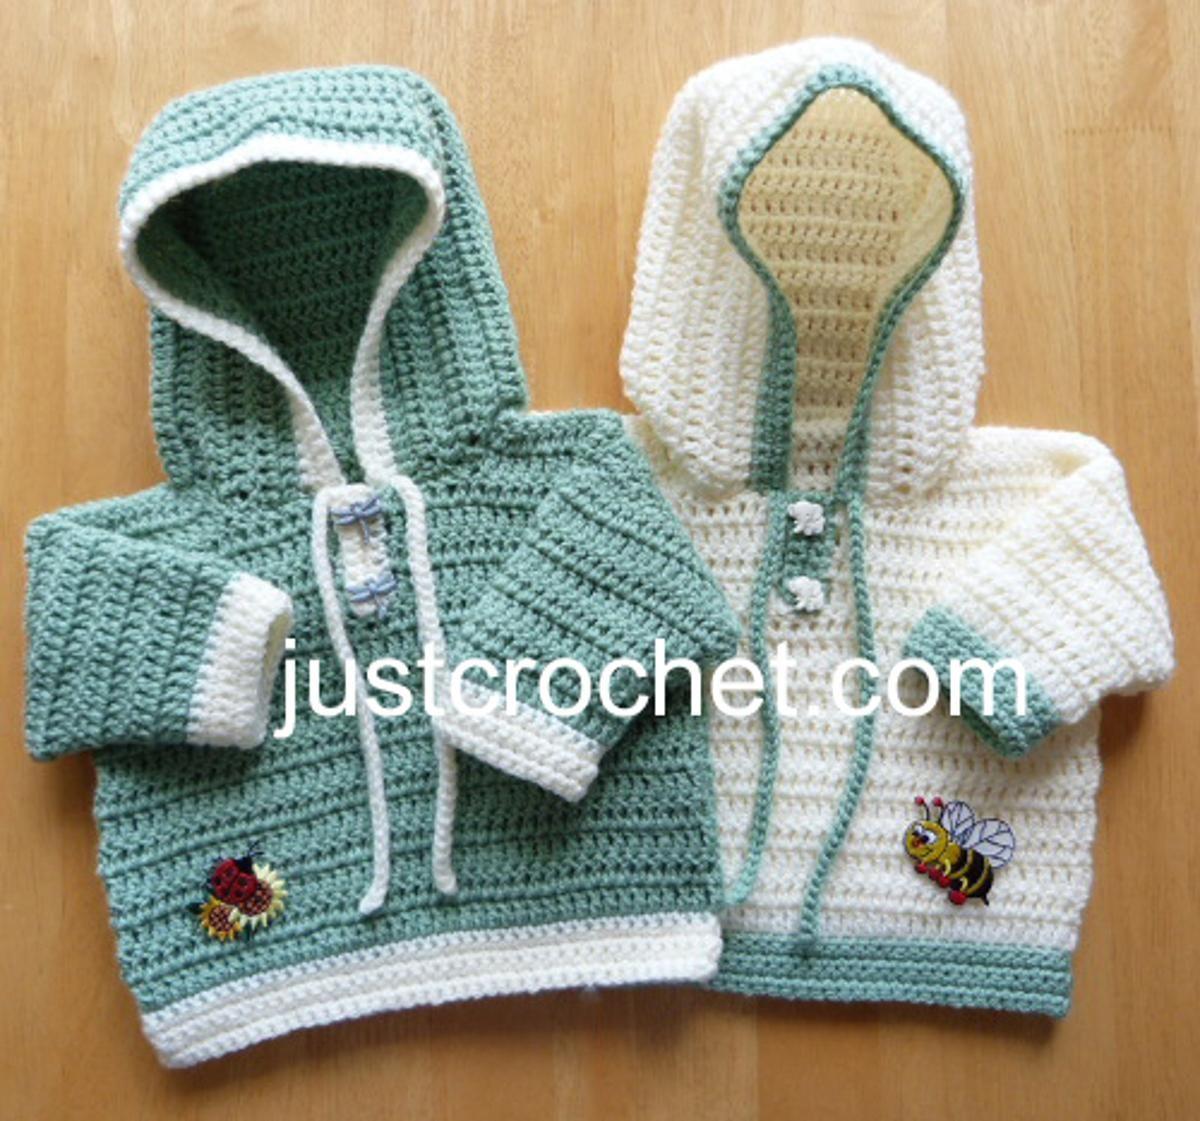 fjc138-Hooded Sweater Baby Crochet Pattern | Craftsy | Crocheting ...